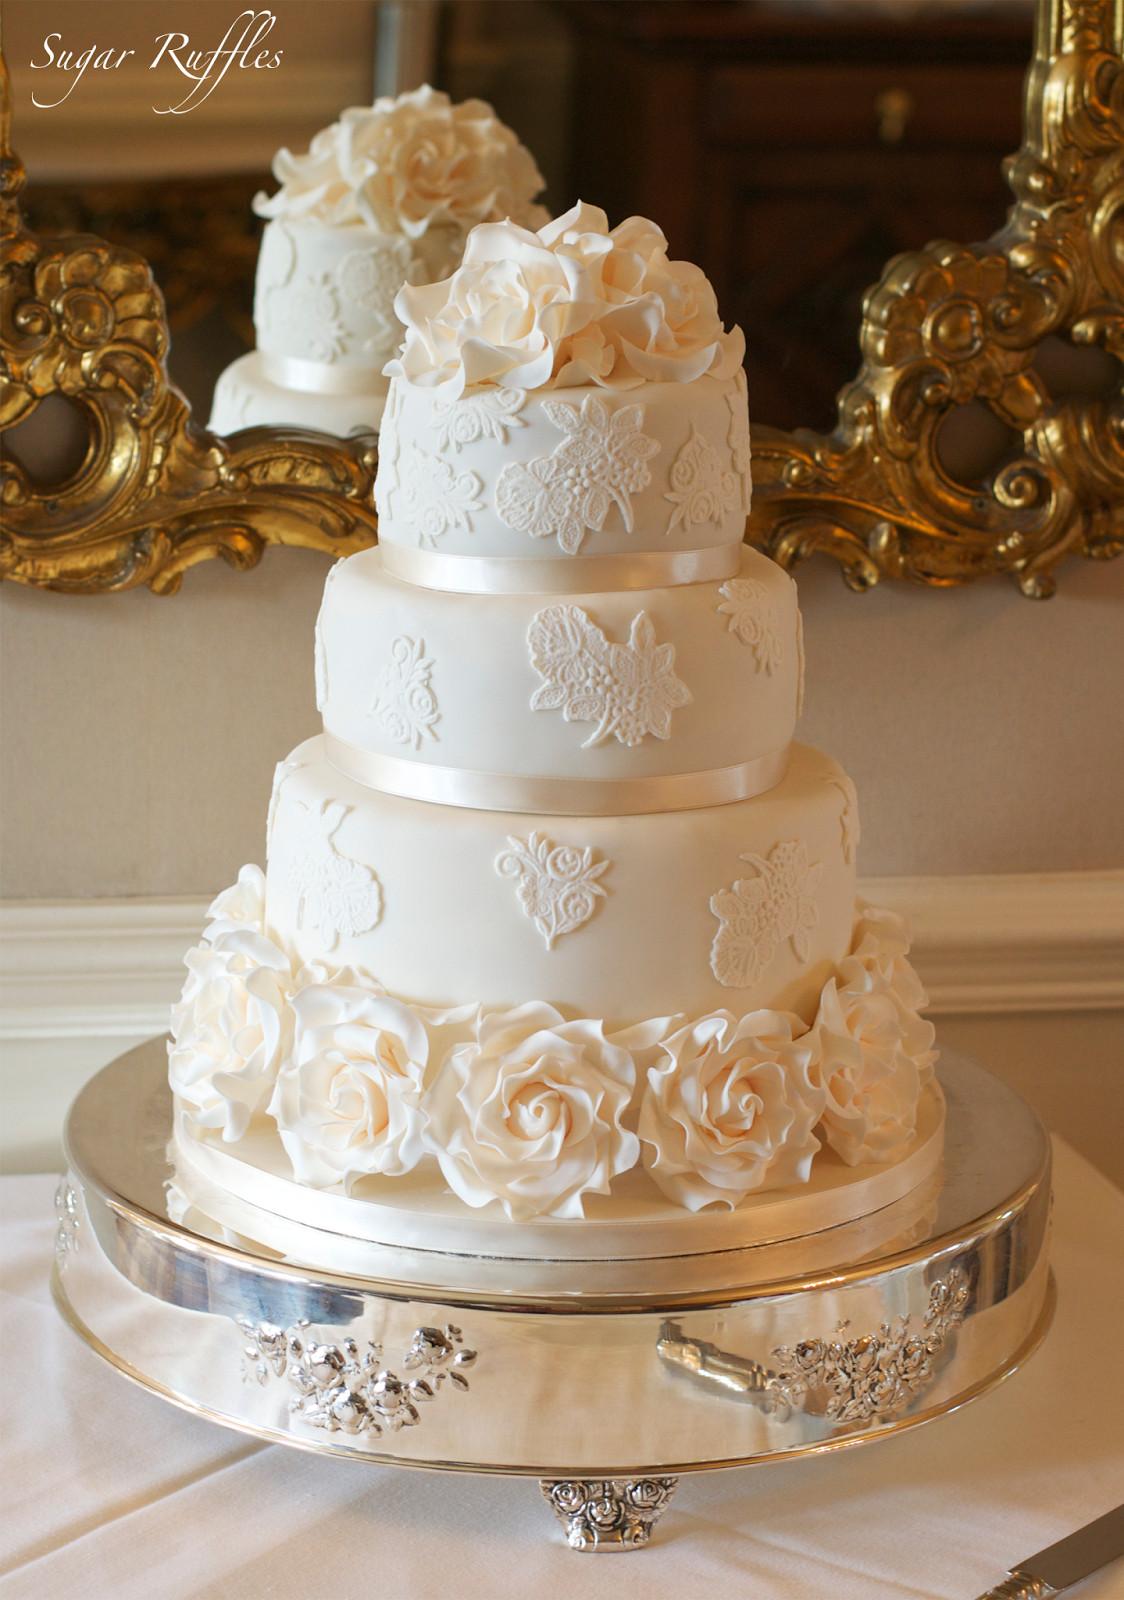 Wedding Cakes Elegant  Wedding Cakes with lace and roses